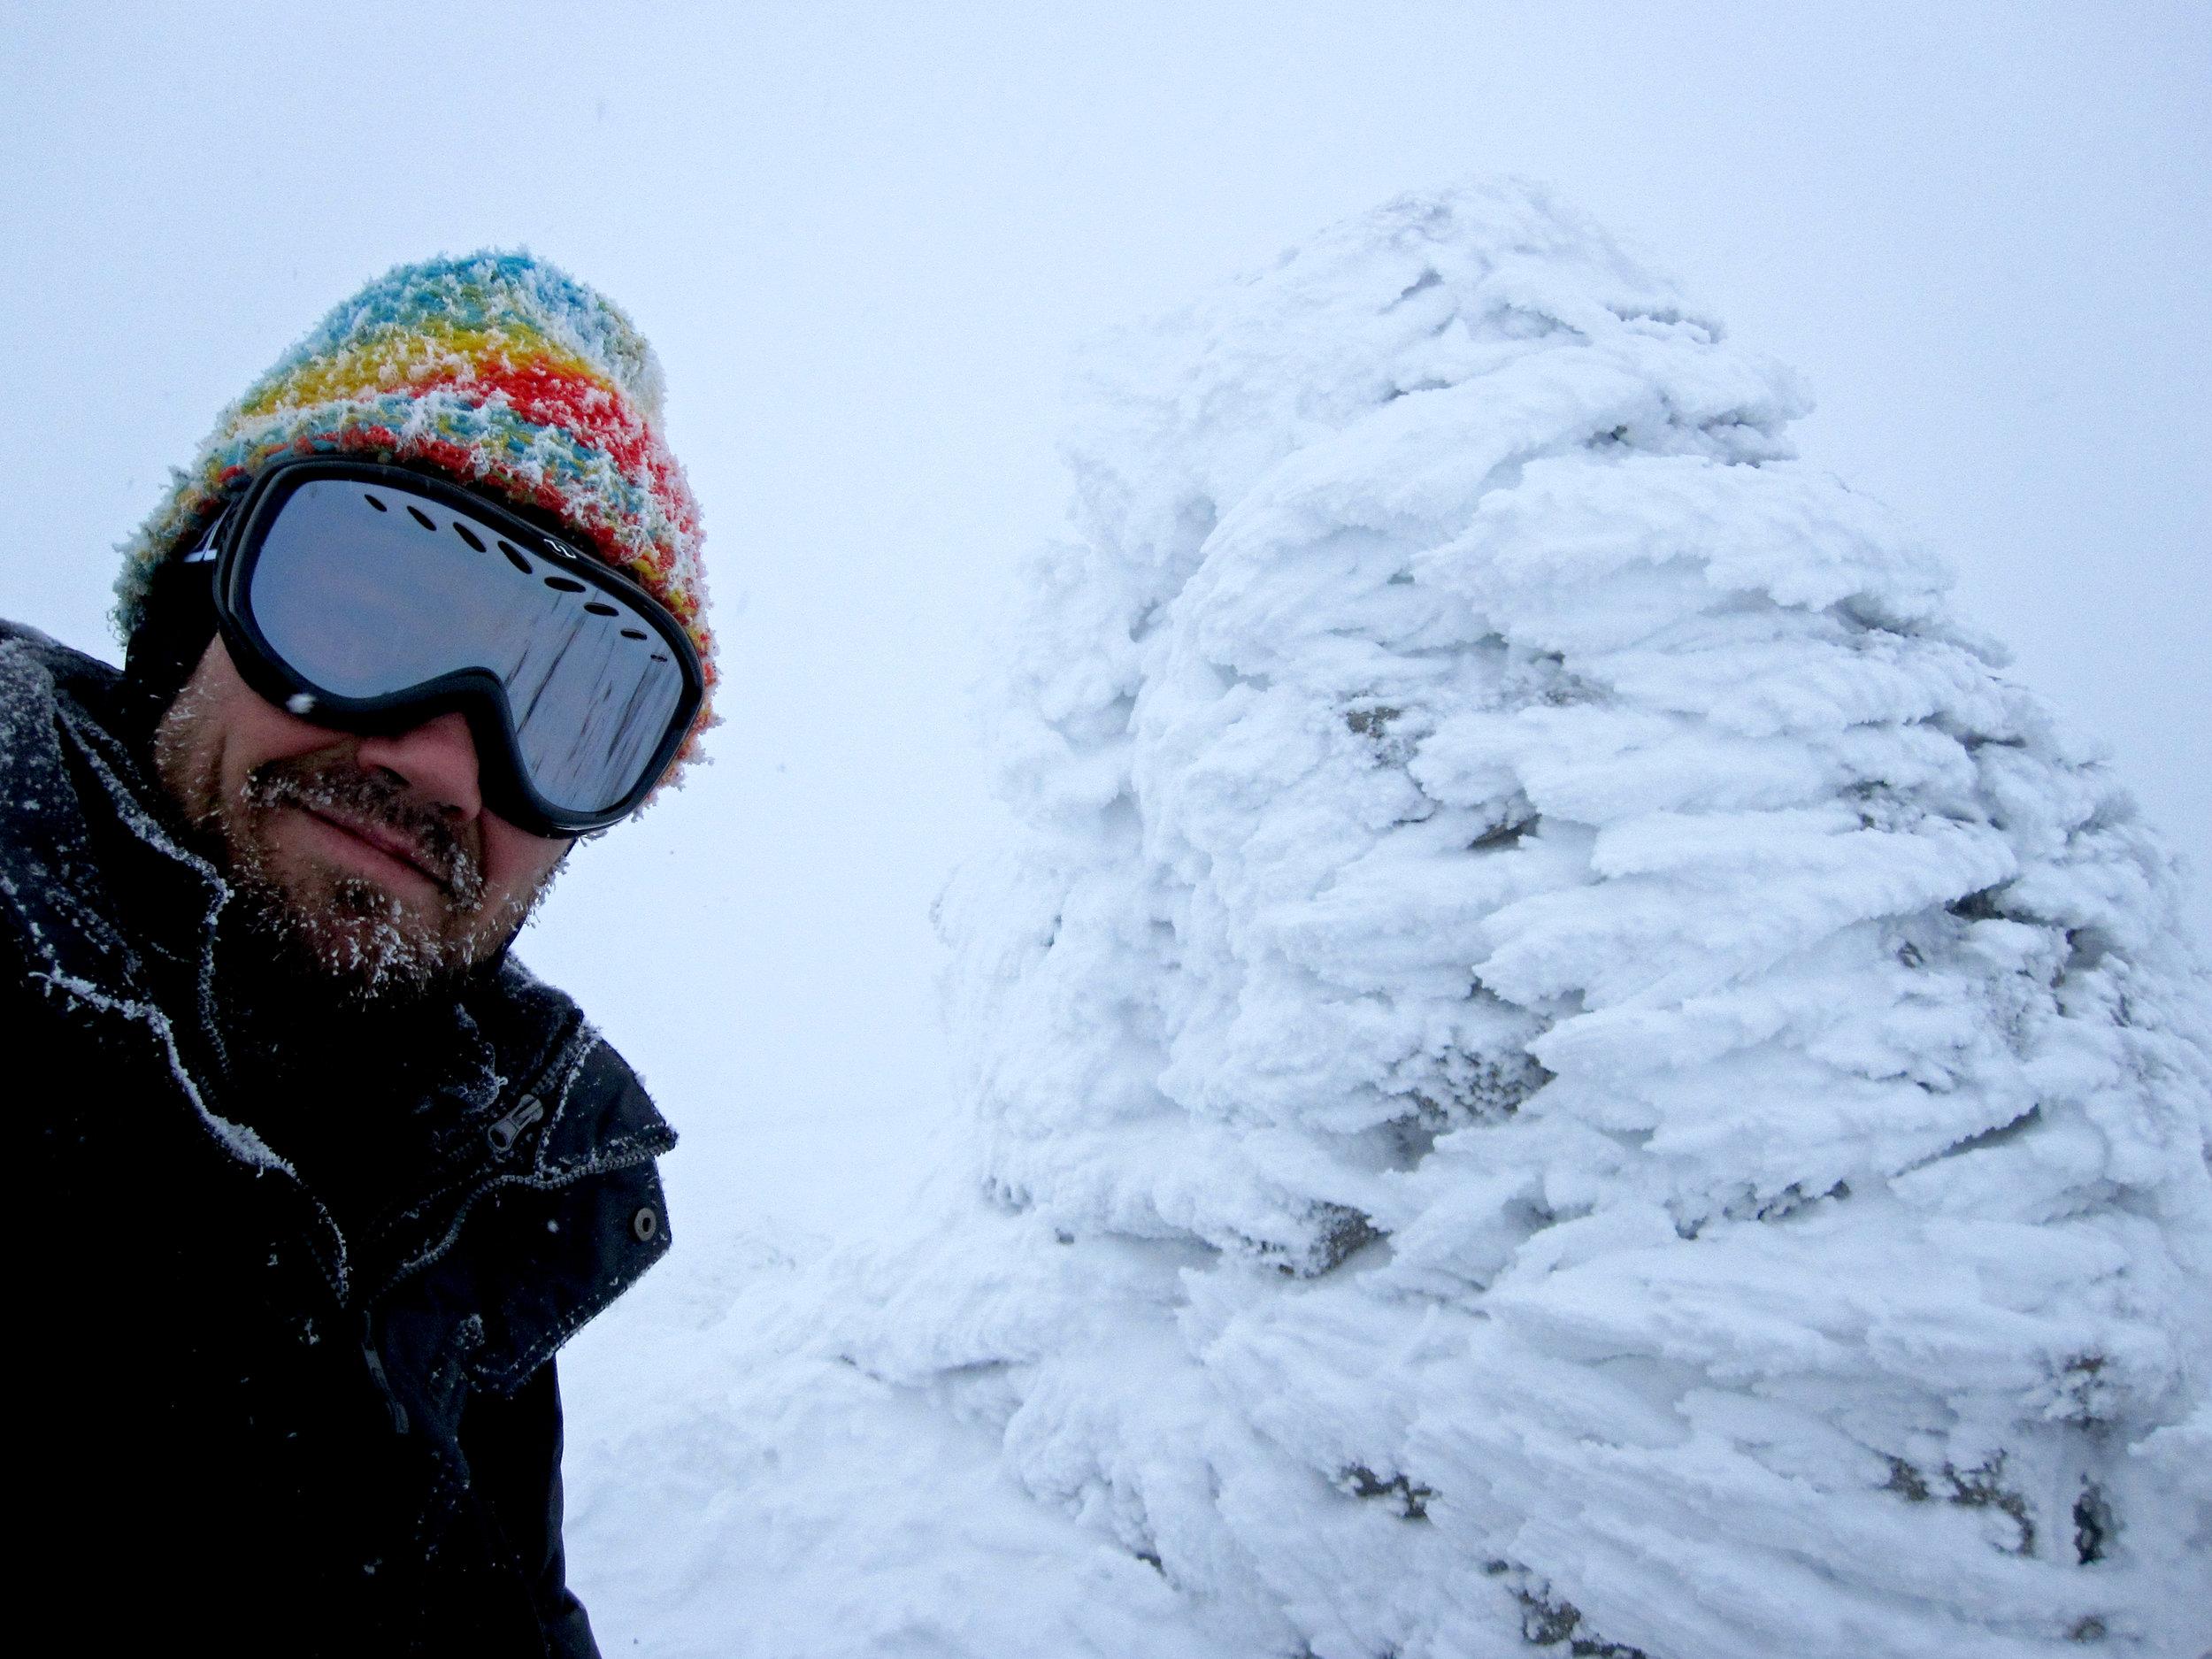 Mount Washington cairn with rime ice.